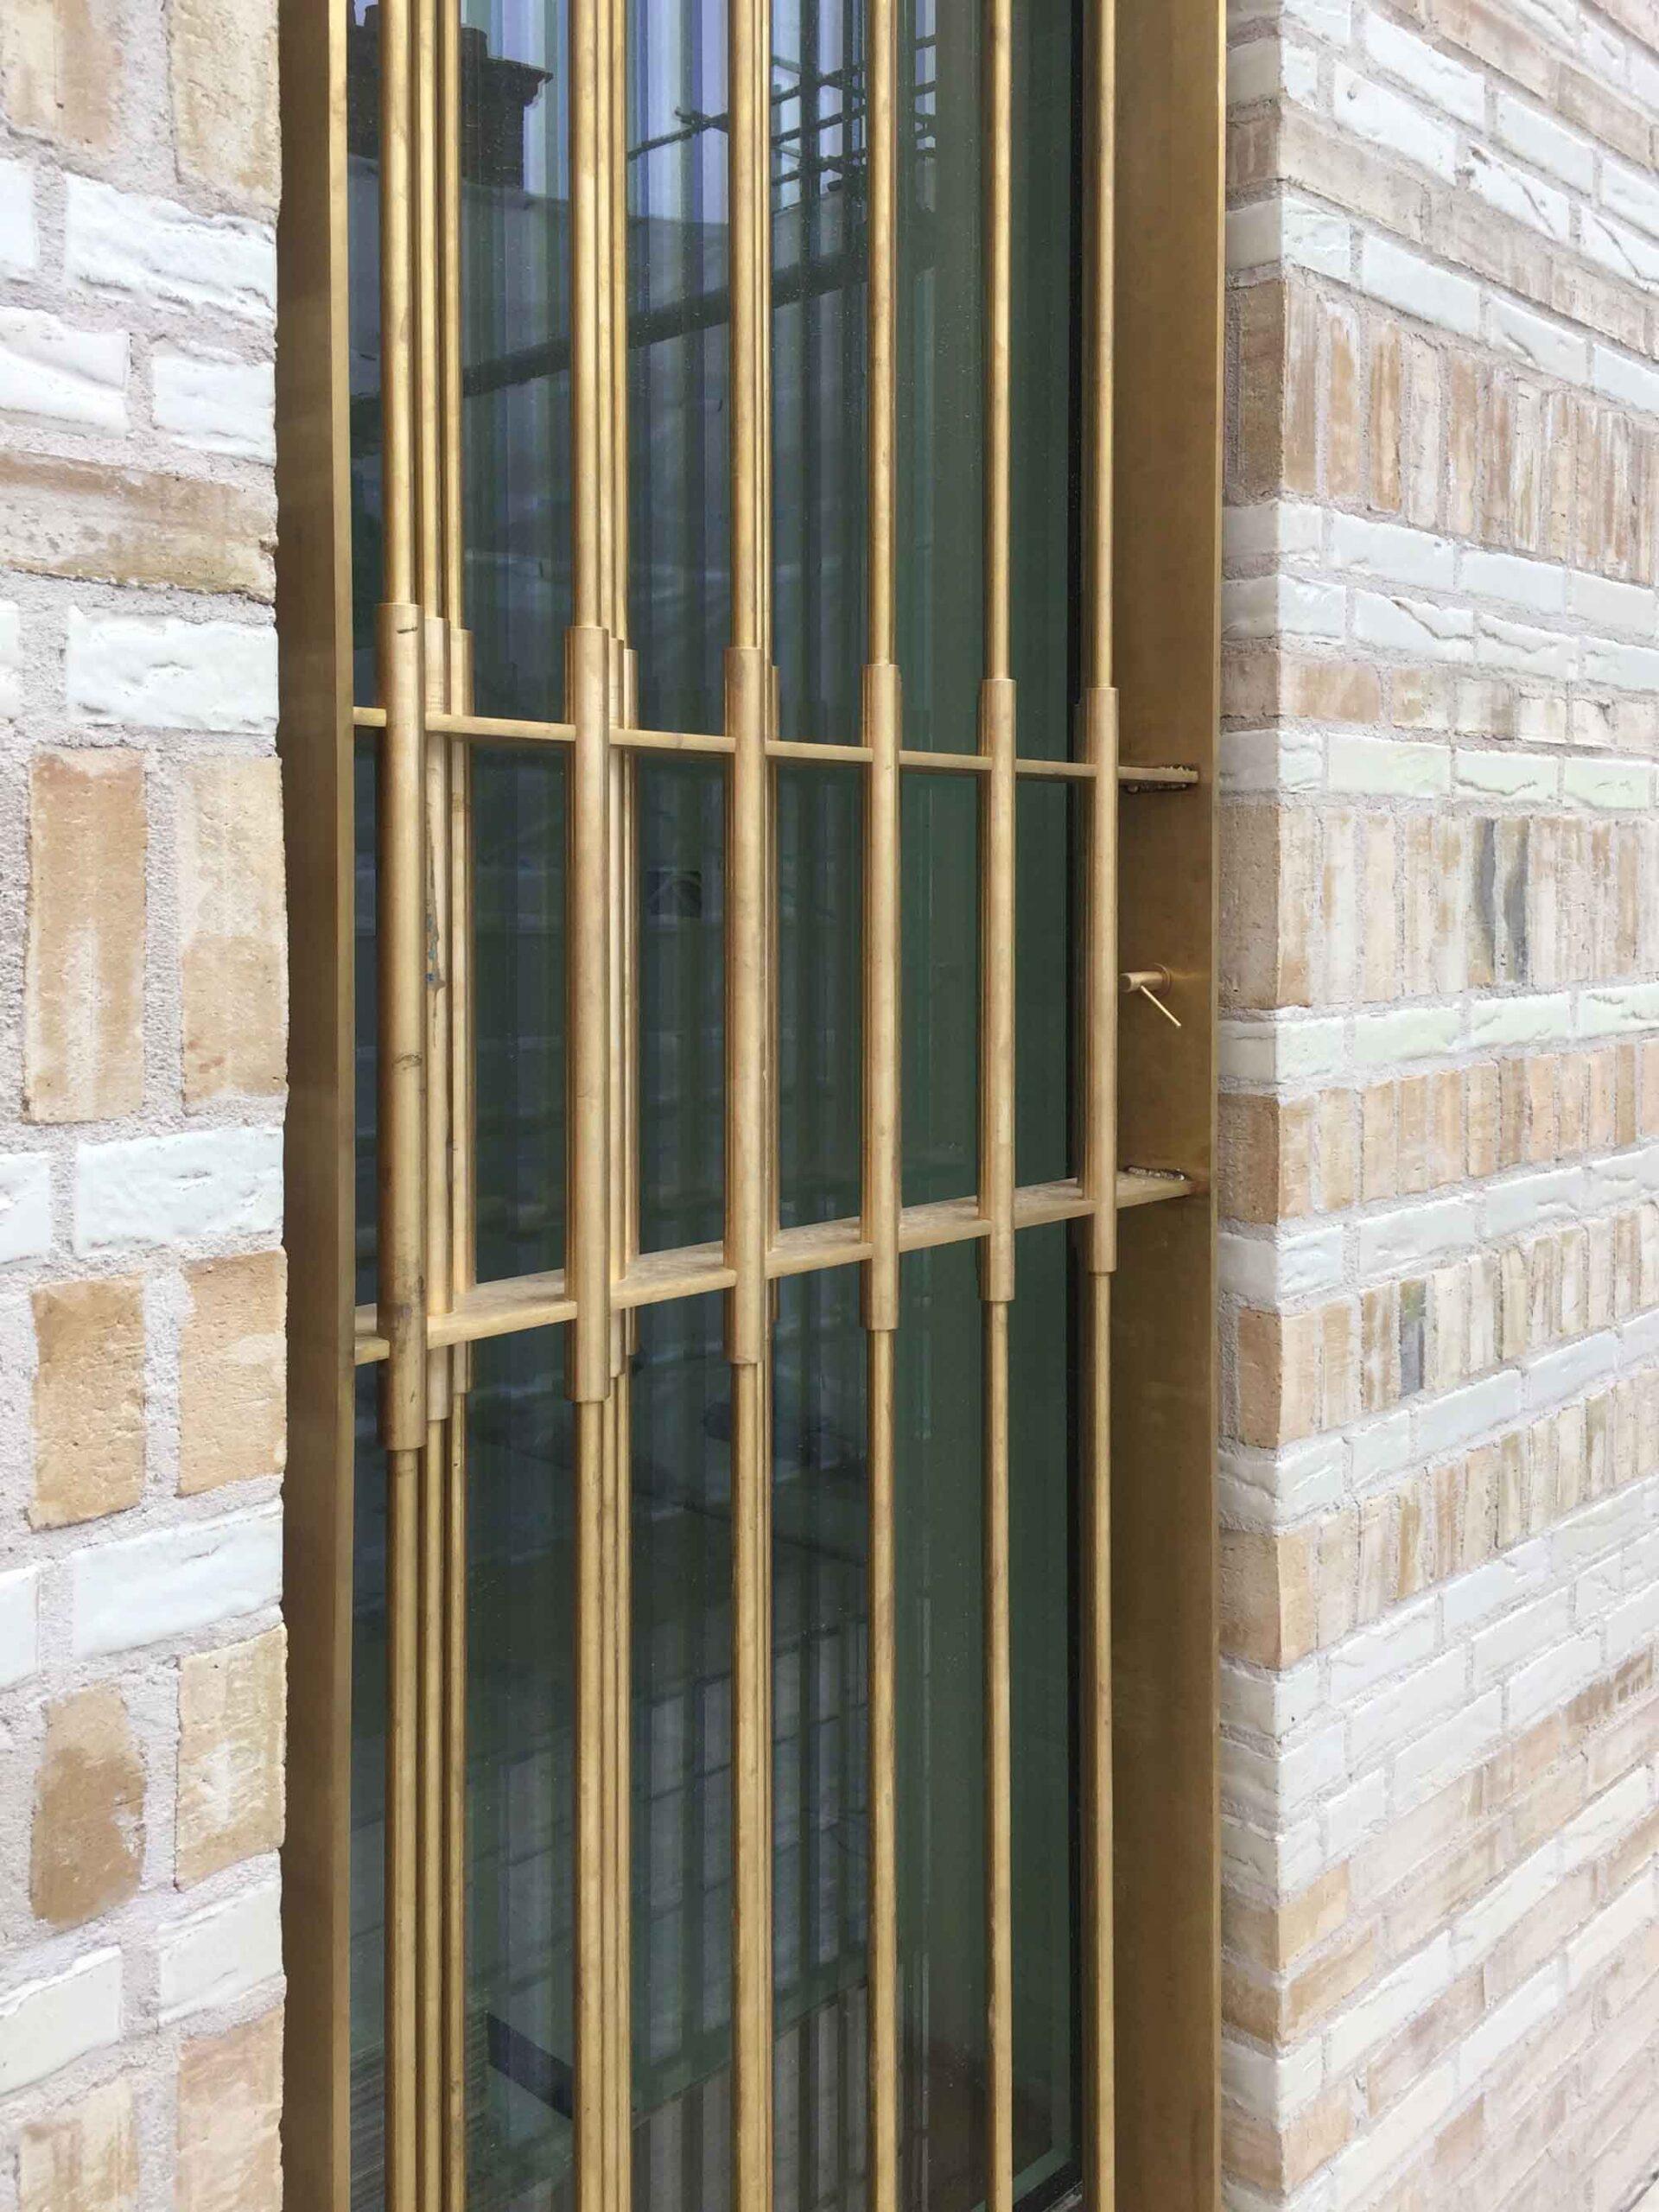 westminster-fire-station-openstudio-architects-window-metal-screen